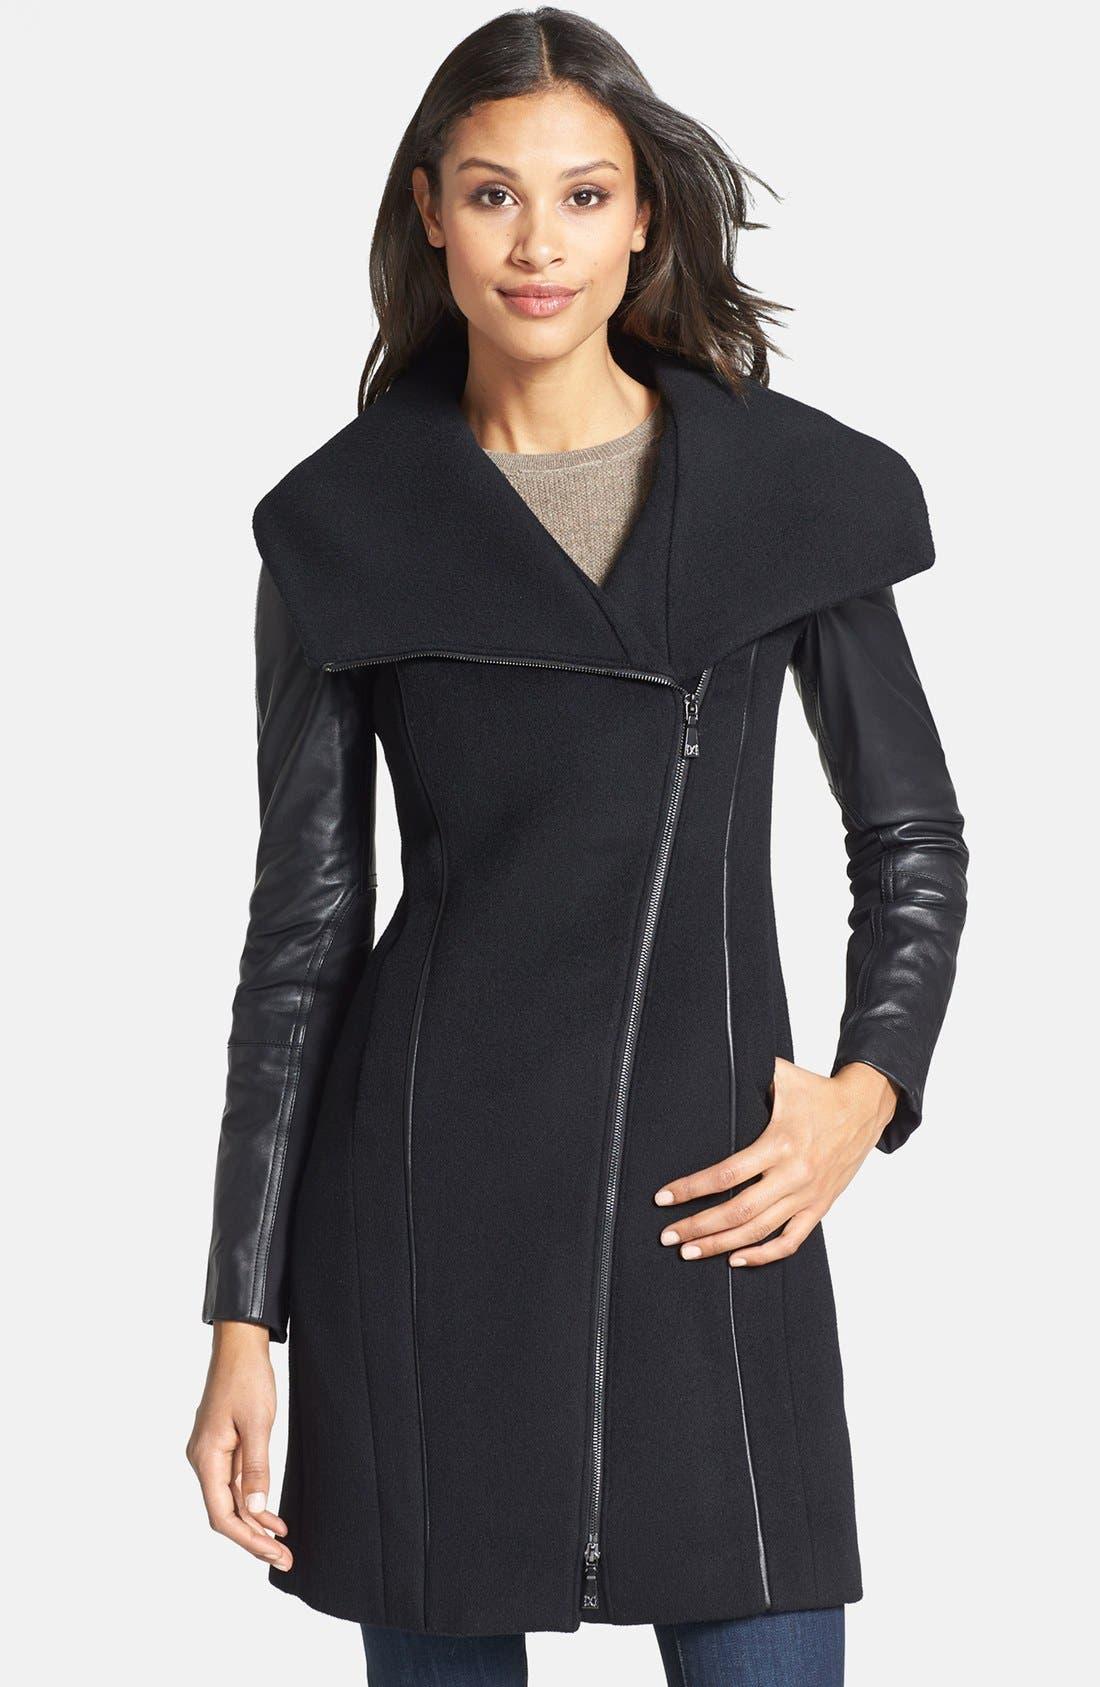 Main Image - Dawn Levy 'Serena' Leather Sleeve Asymmetrical Wool Coat